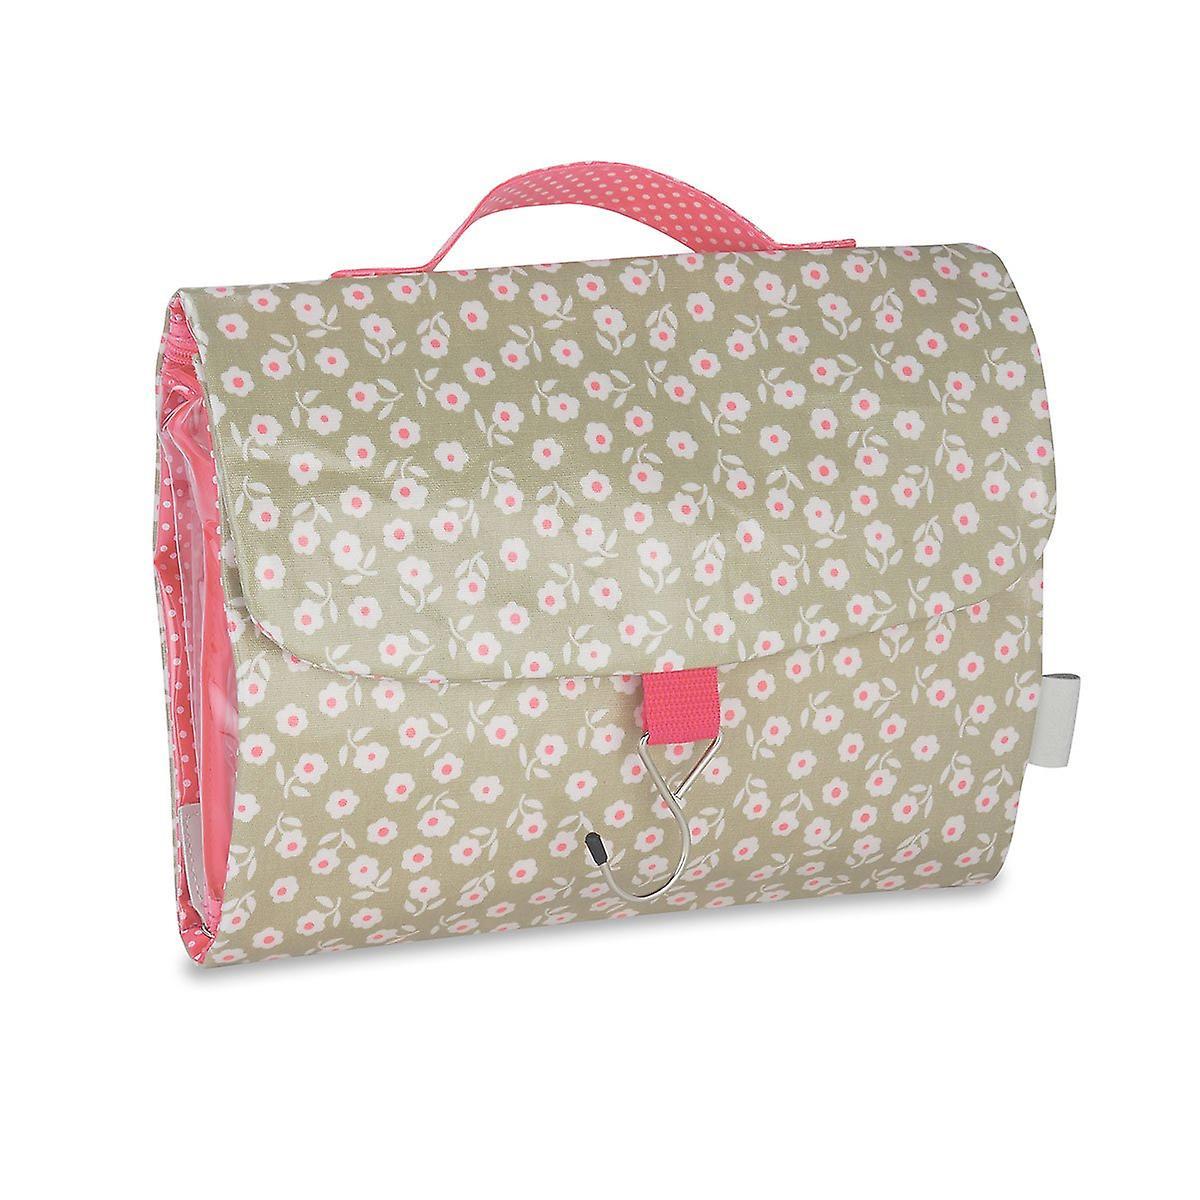 'daisy' threefold hanging wash bag - sage